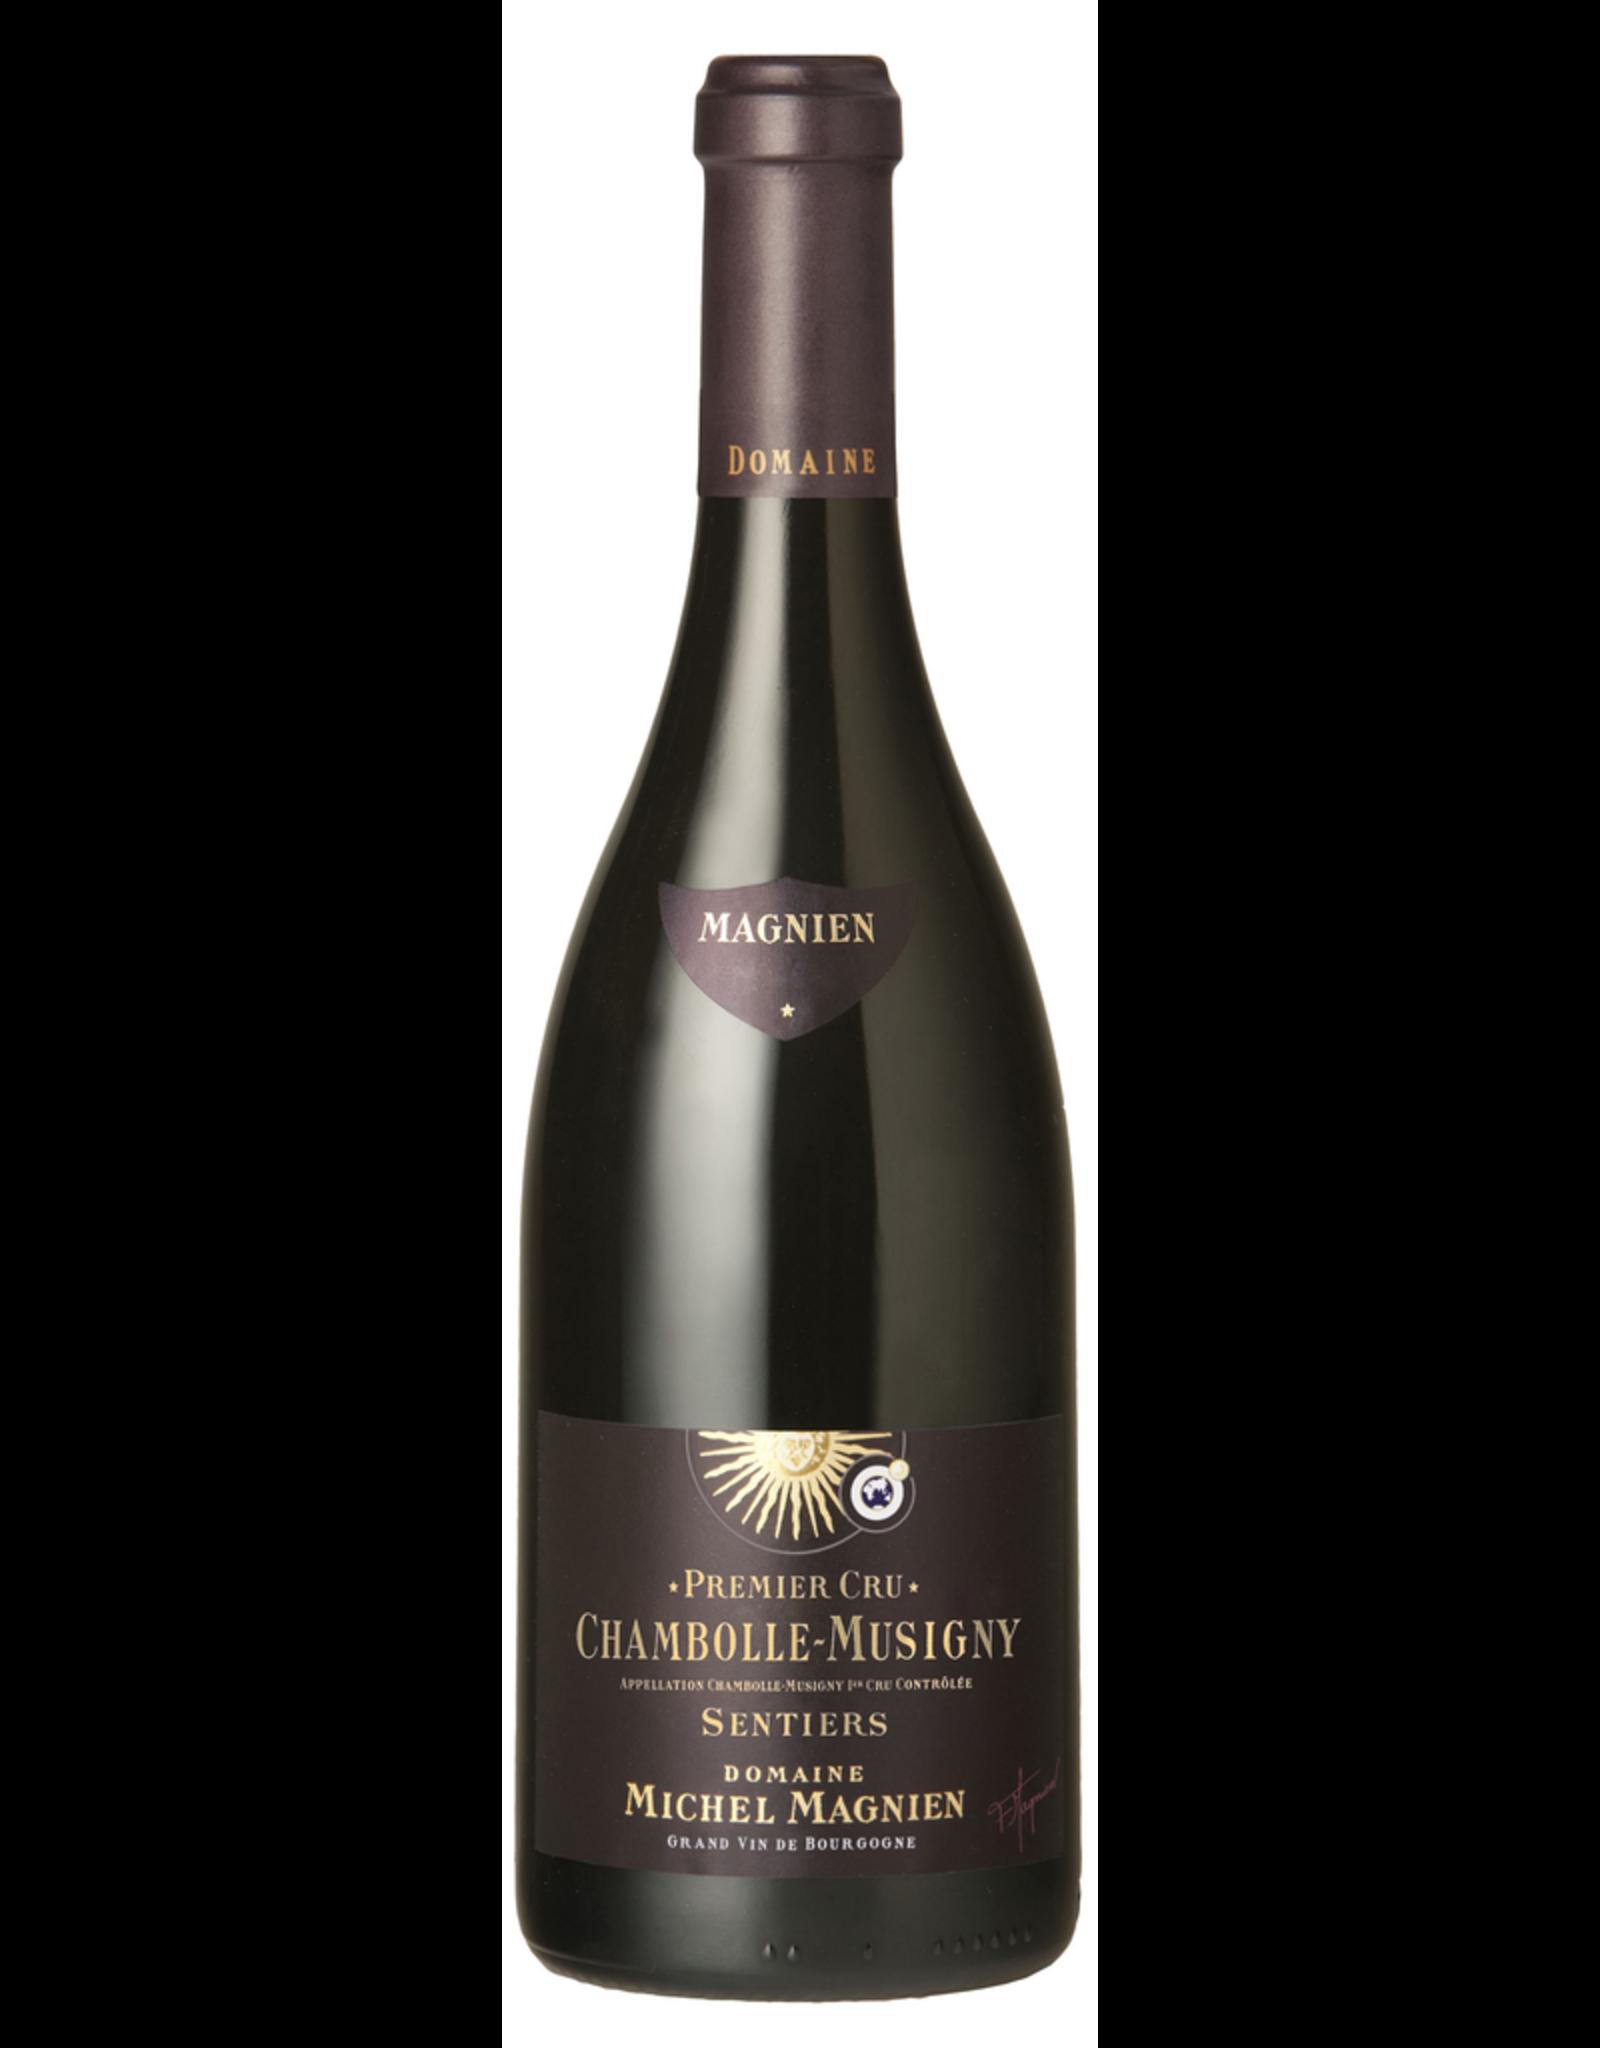 Red Wine 2016, Michael Magnien Chambolle-Musigny Sentiers Premier Cru, Pinot Noir, Cote de Beaune, Burgundy, France, 13% Alc, CT